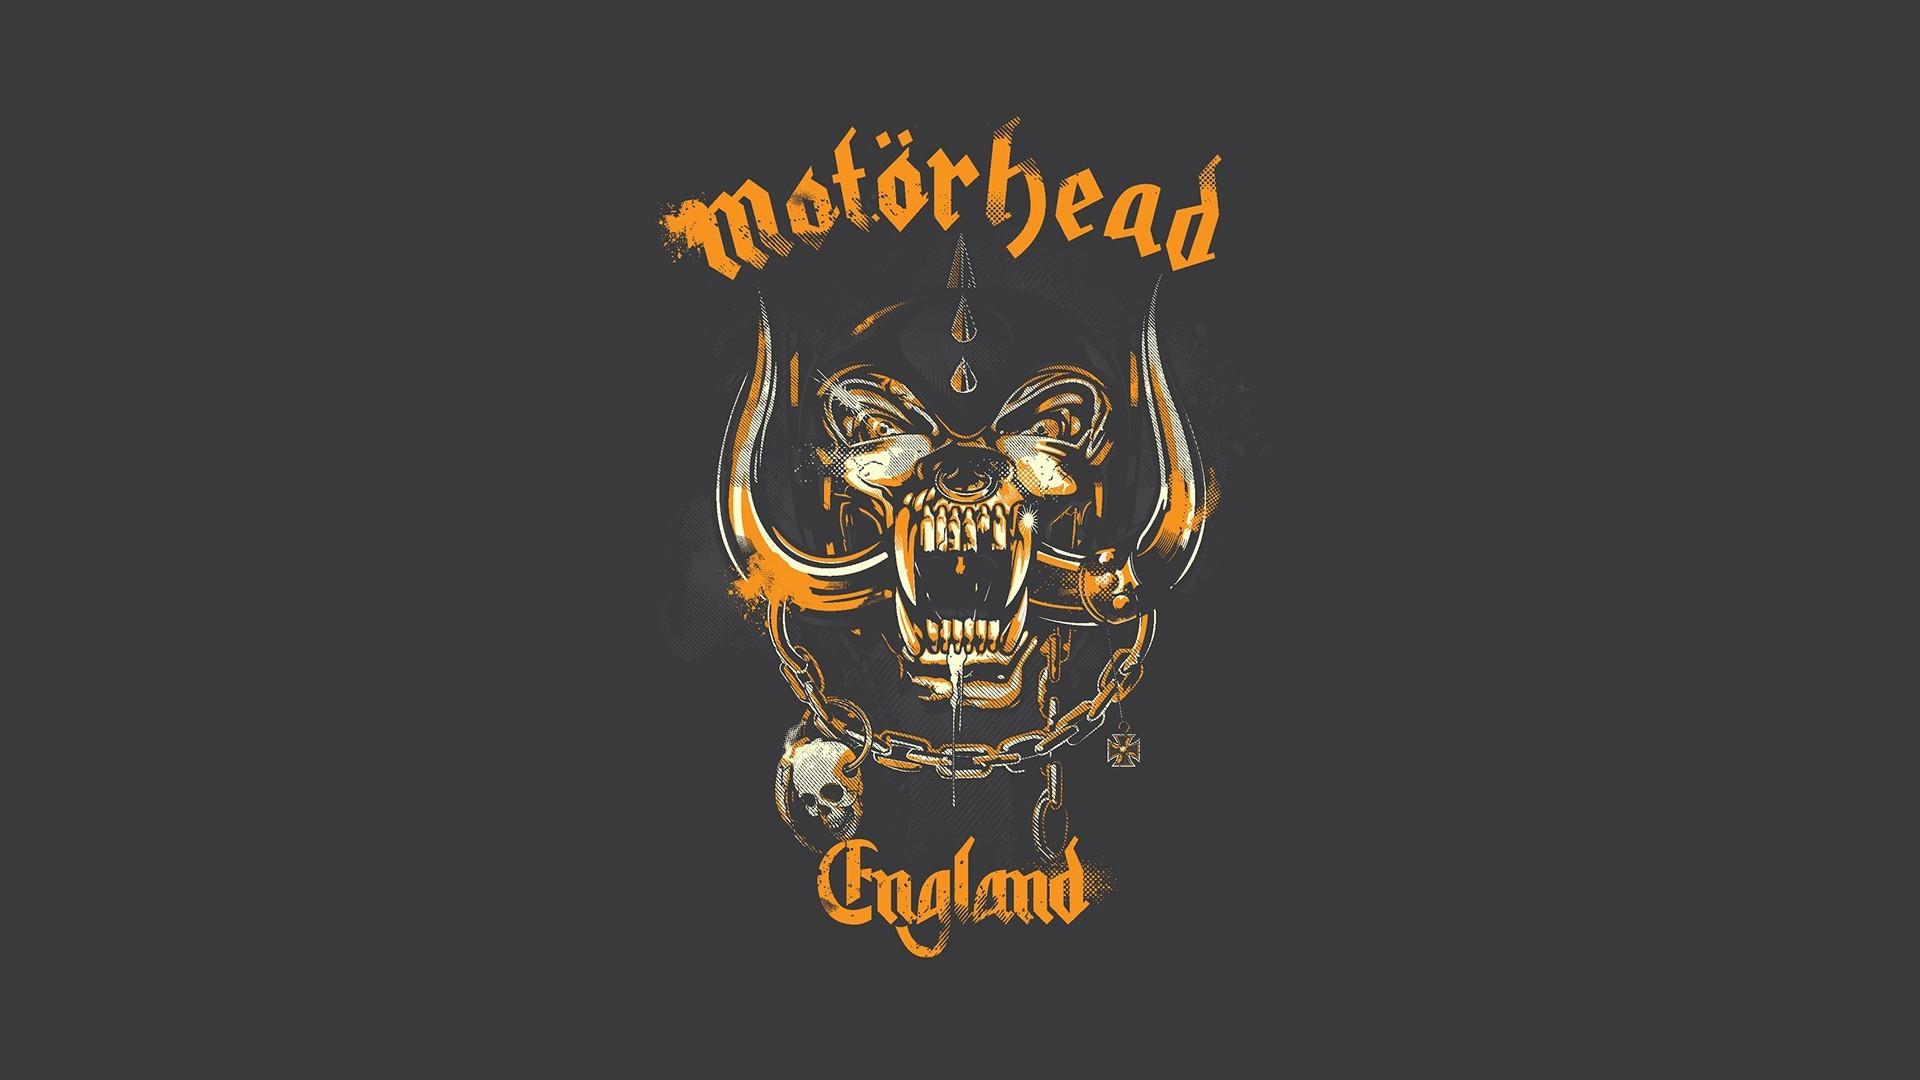 Lemmy Kilmister Rock Music Motorhead Wallpaper Hd: Motorhead Wallpaper HD (50+ Images